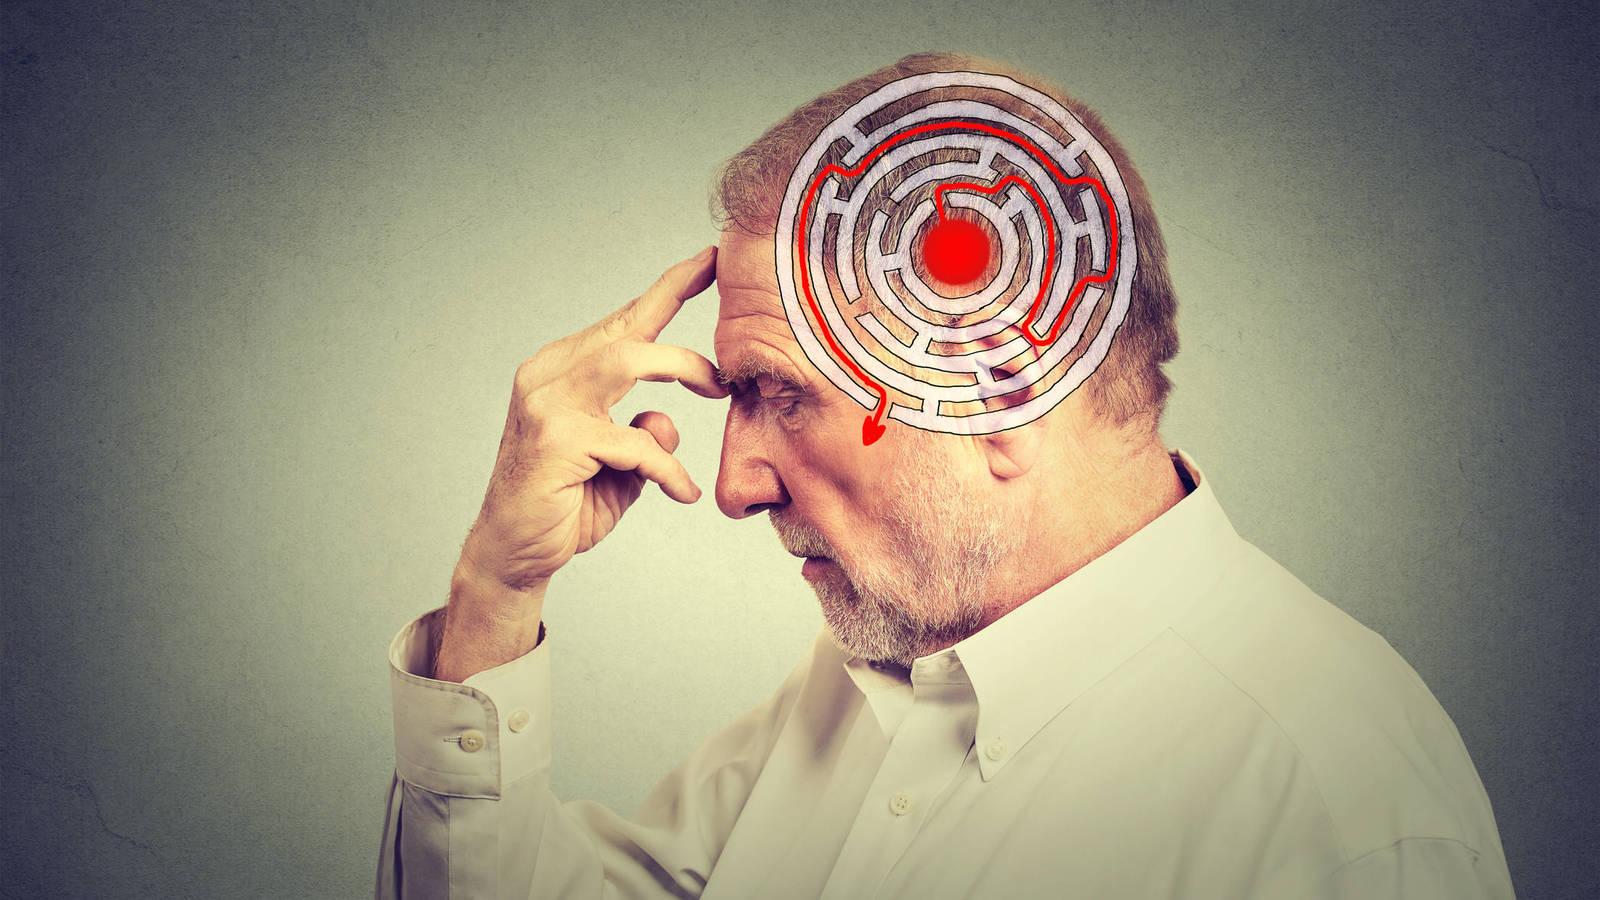 Los hábitos que debes seguir para evitarlo #21Sept — Día del Alzheimer